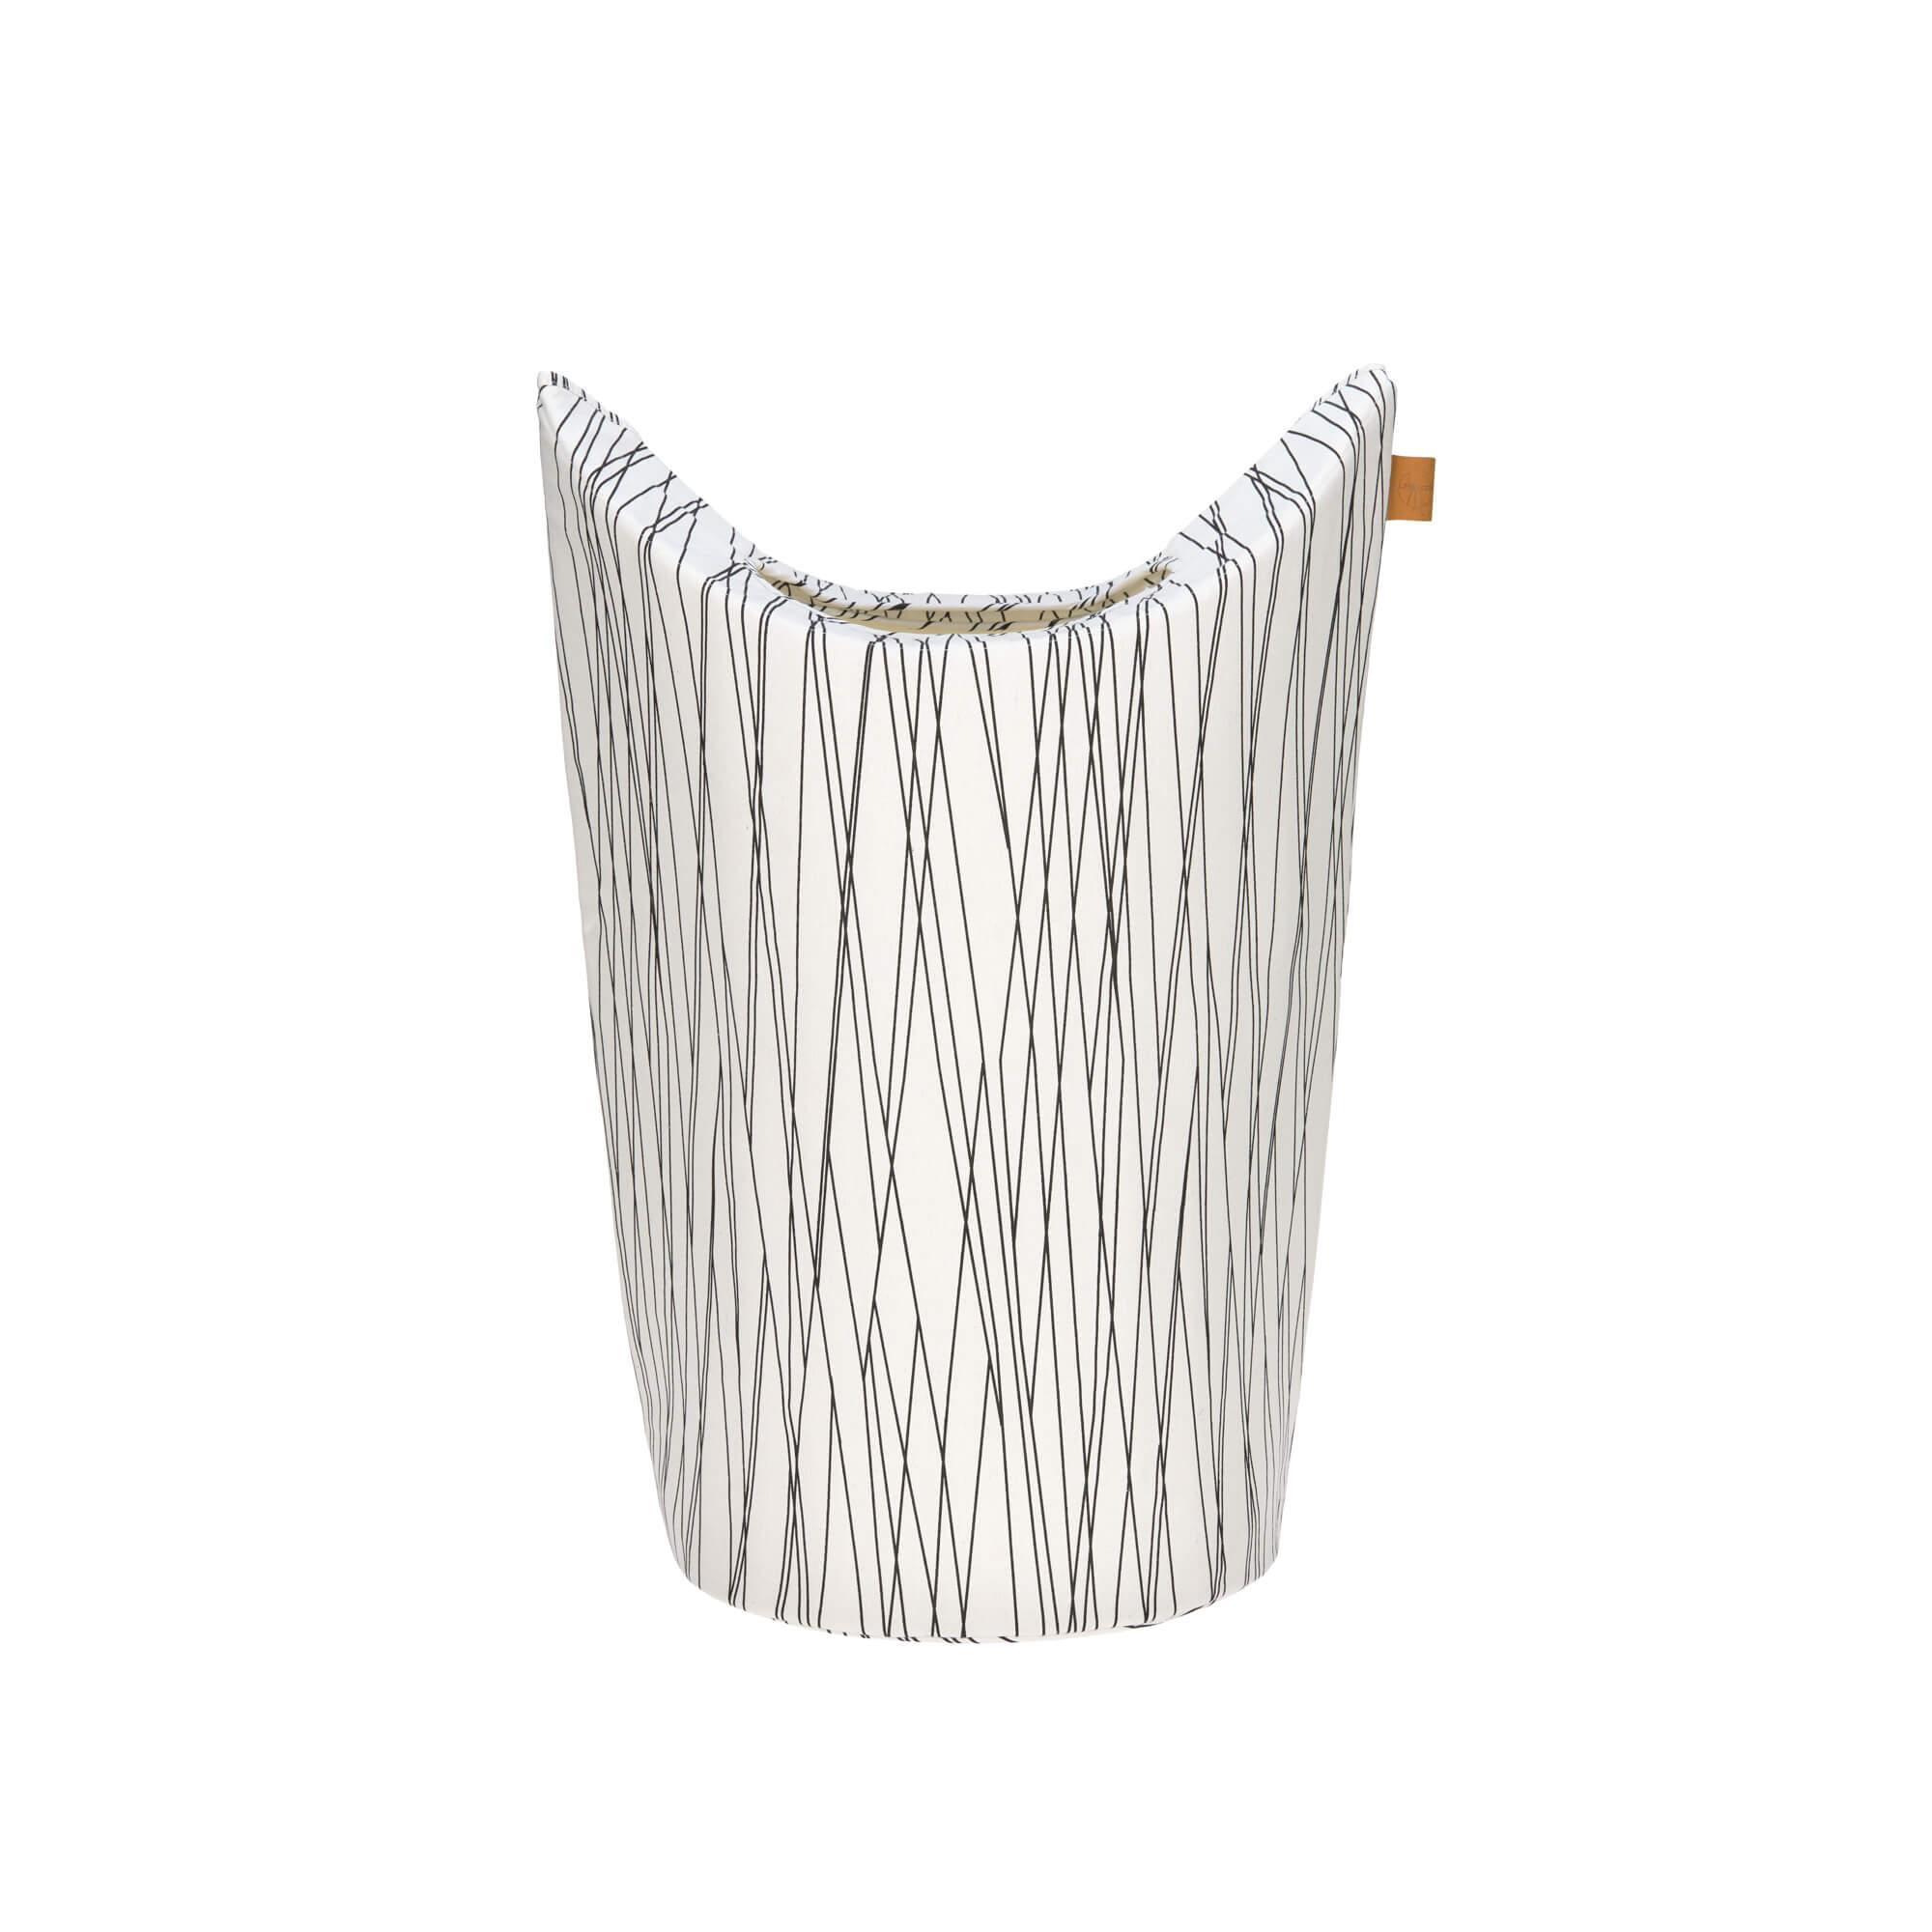 Wäschekorb Kinderzimmer Lässig ~ Lässig Wäschekorb Laundry Bag Allover Rays black LäSSIG FASHION